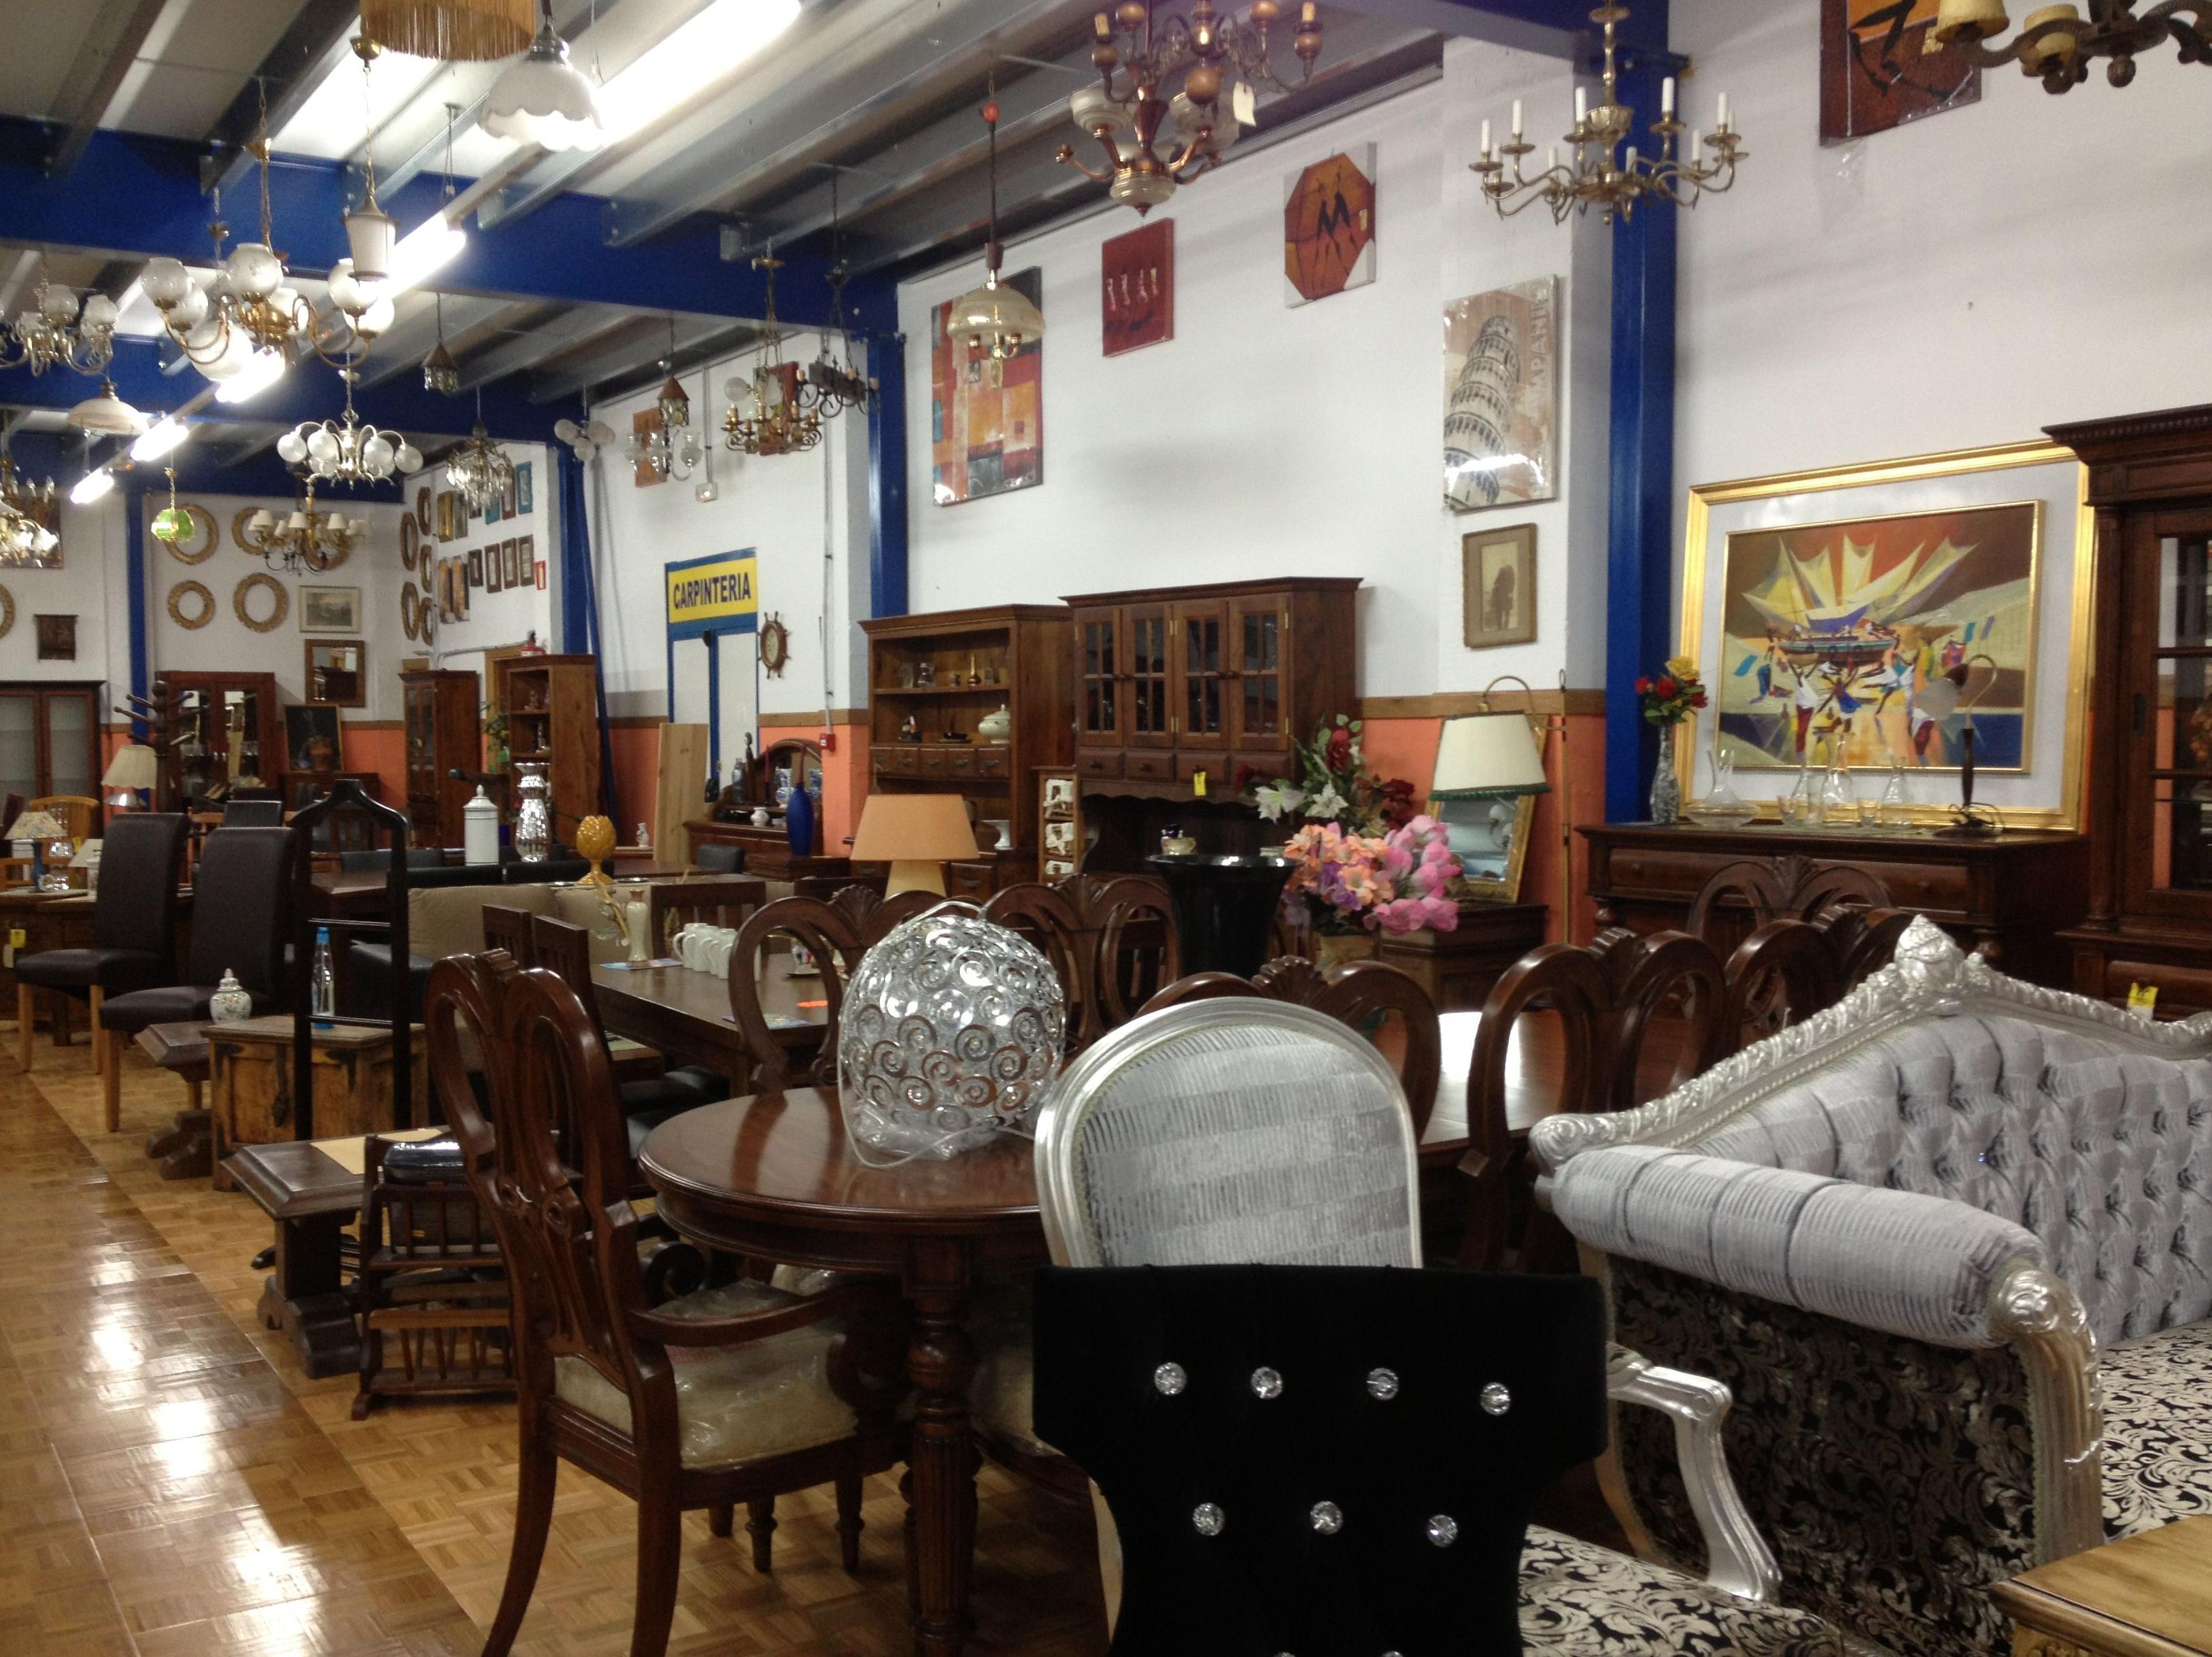 Segunda Mano Antiguedades Muebles Idea Creativa Della Casa E  # Loquo Muebles Segunda Mano Barcelona